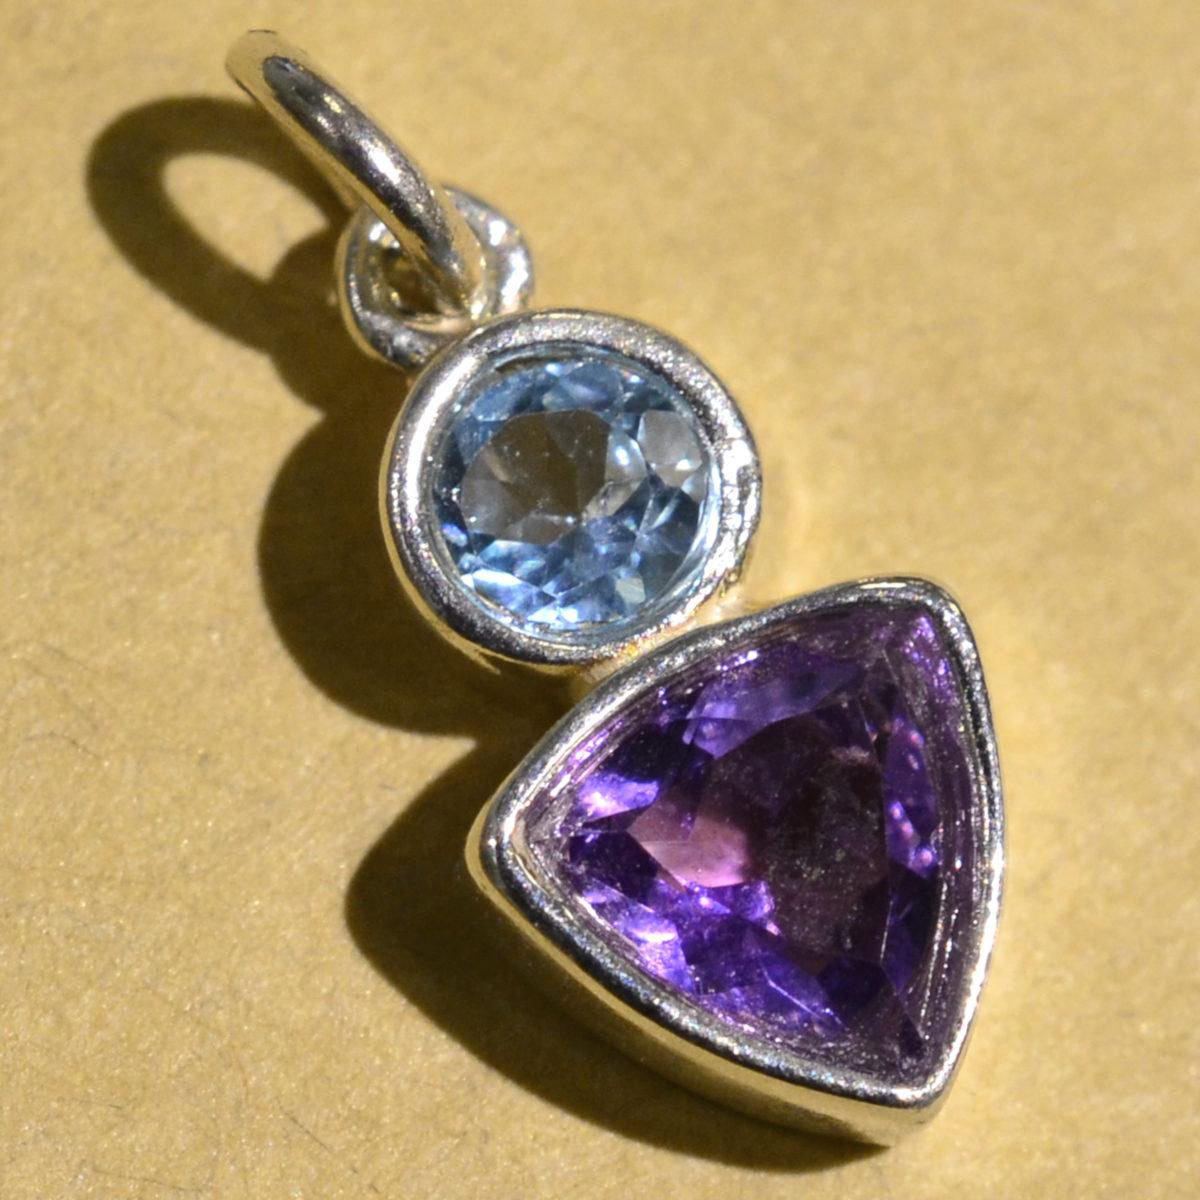 Sierra Designs blue topaz and amethyst petite gemstone pendant